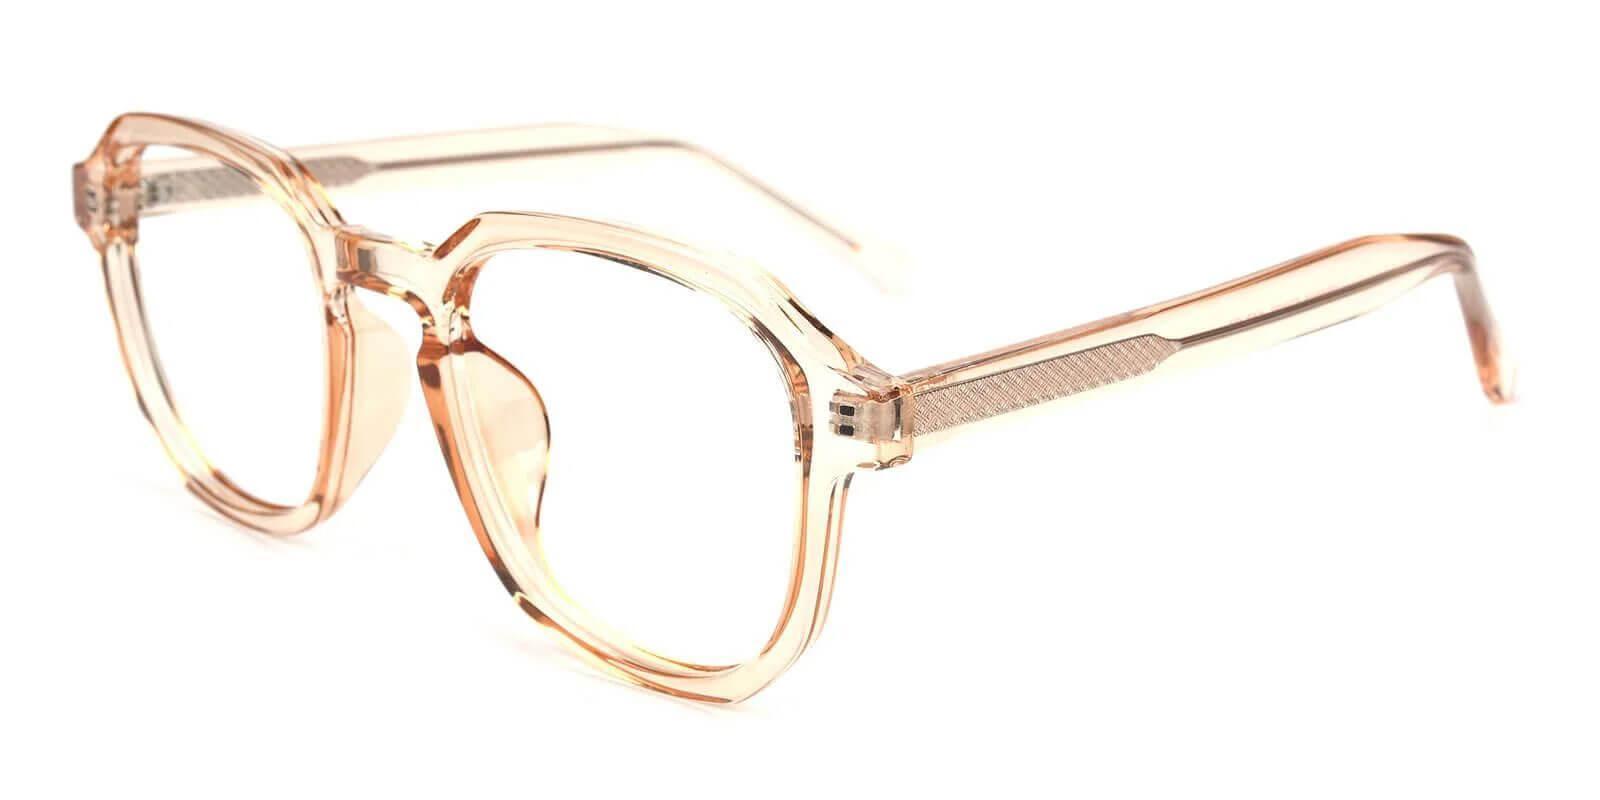 Lancet Orange Acetate Eyeglasses , SpringHinges , UniversalBridgeFit Frames from ABBE Glasses